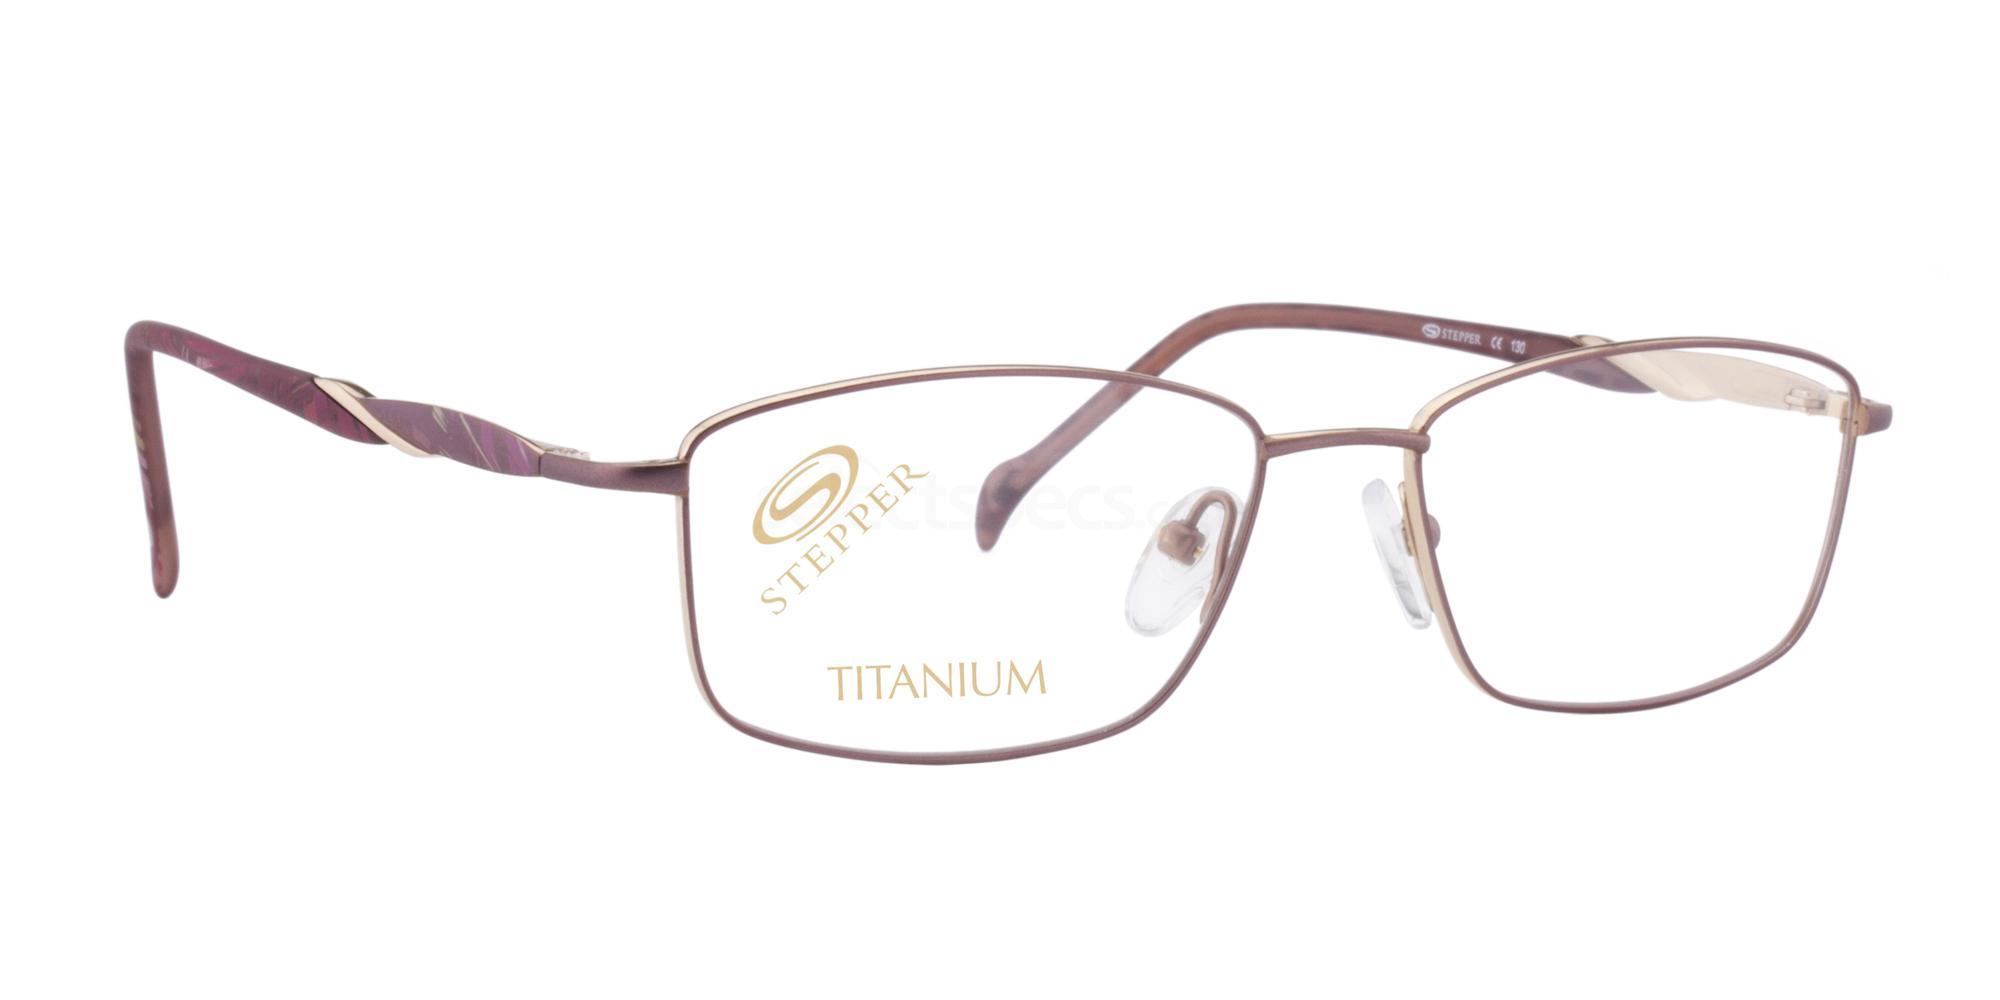 Stepper Eyewear SI 50105 glasses. Free lenses   delivery ... 637cb3122d